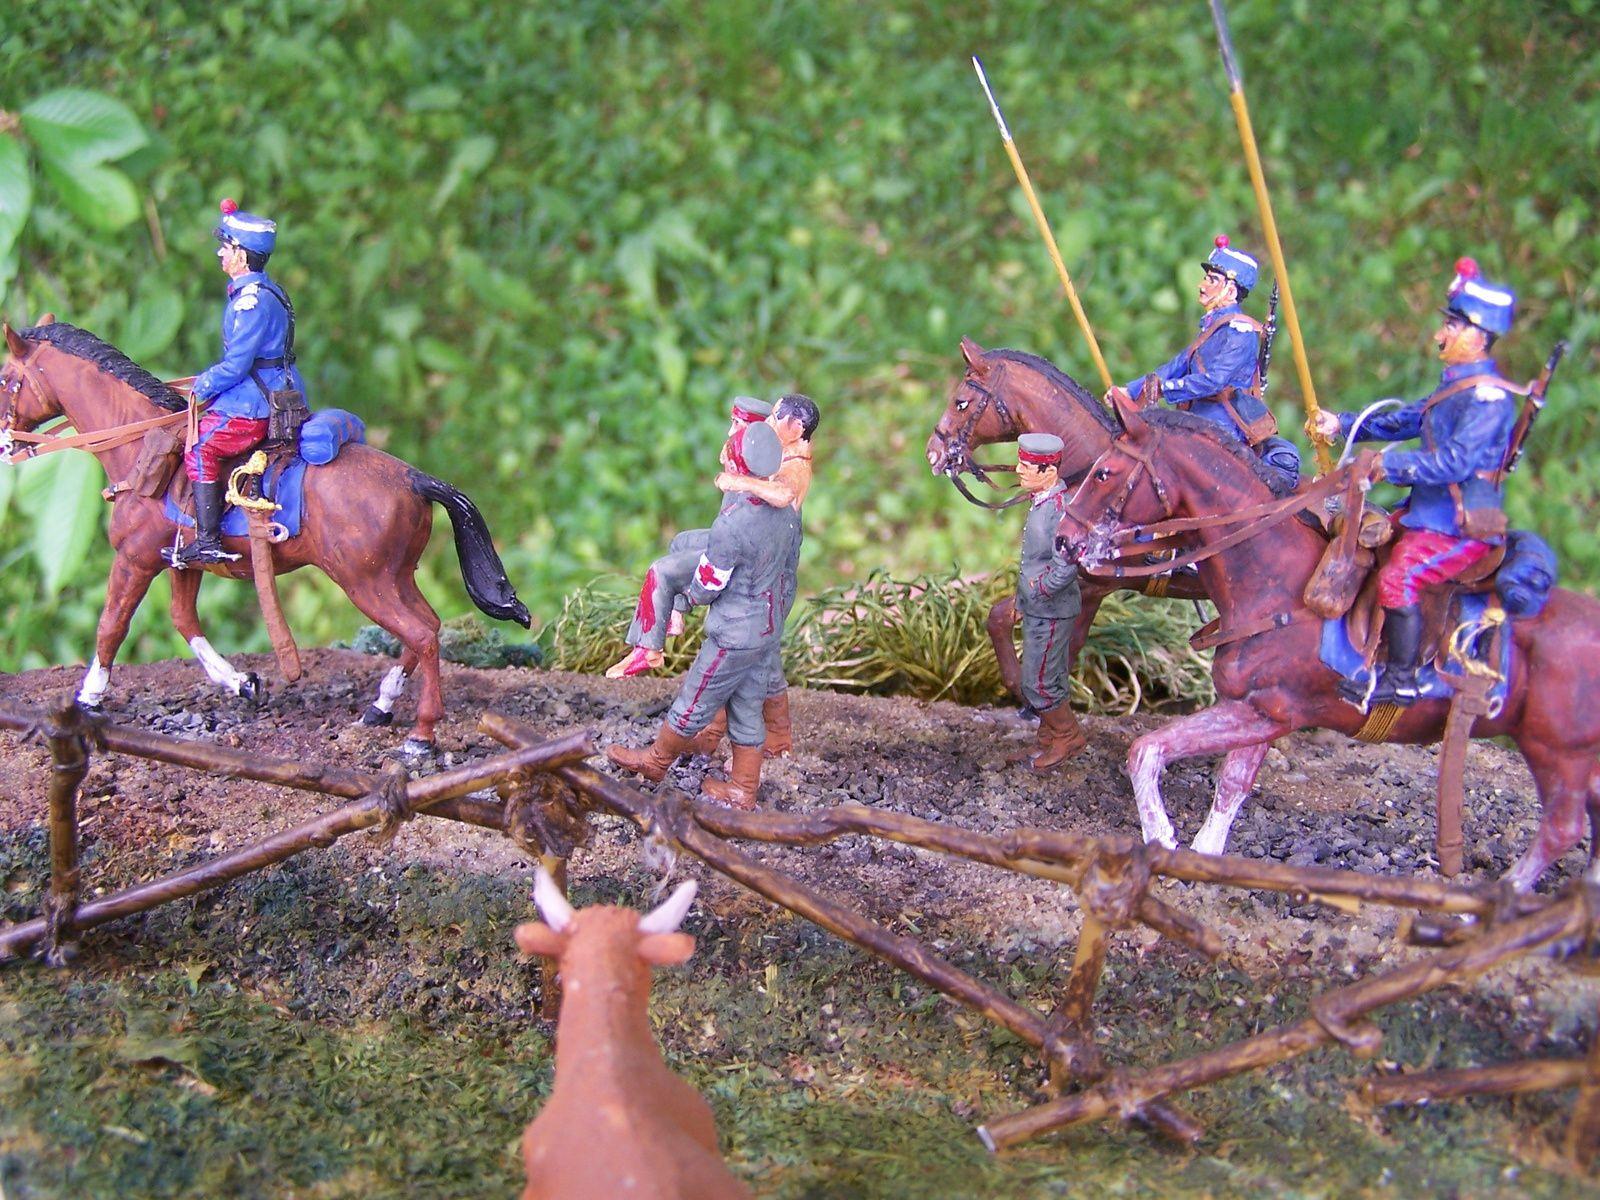 Presq'un rève pour des Chasseurs à cheval !!!! Diorama WW1 1914/1918